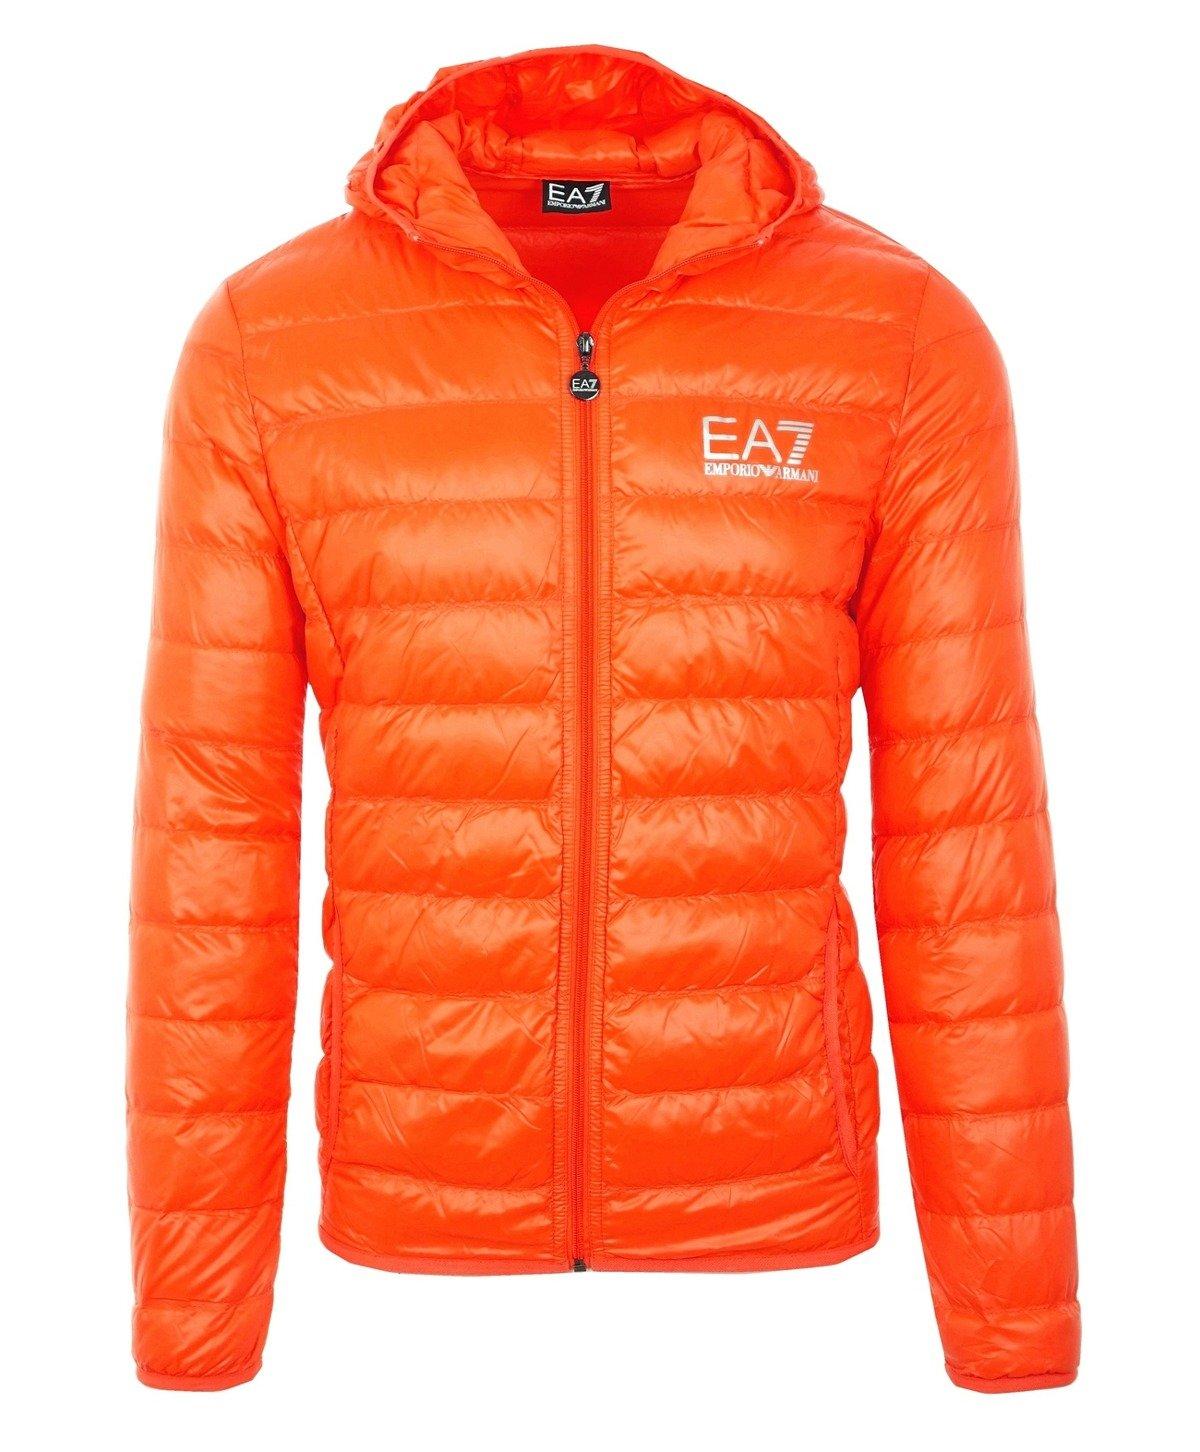 dd79d4e036fa2b EMPORIO ARMANI EA7 Herren Men Daunen Down Steppjacke Jacket Kapuze Orange  Click to zoom ...